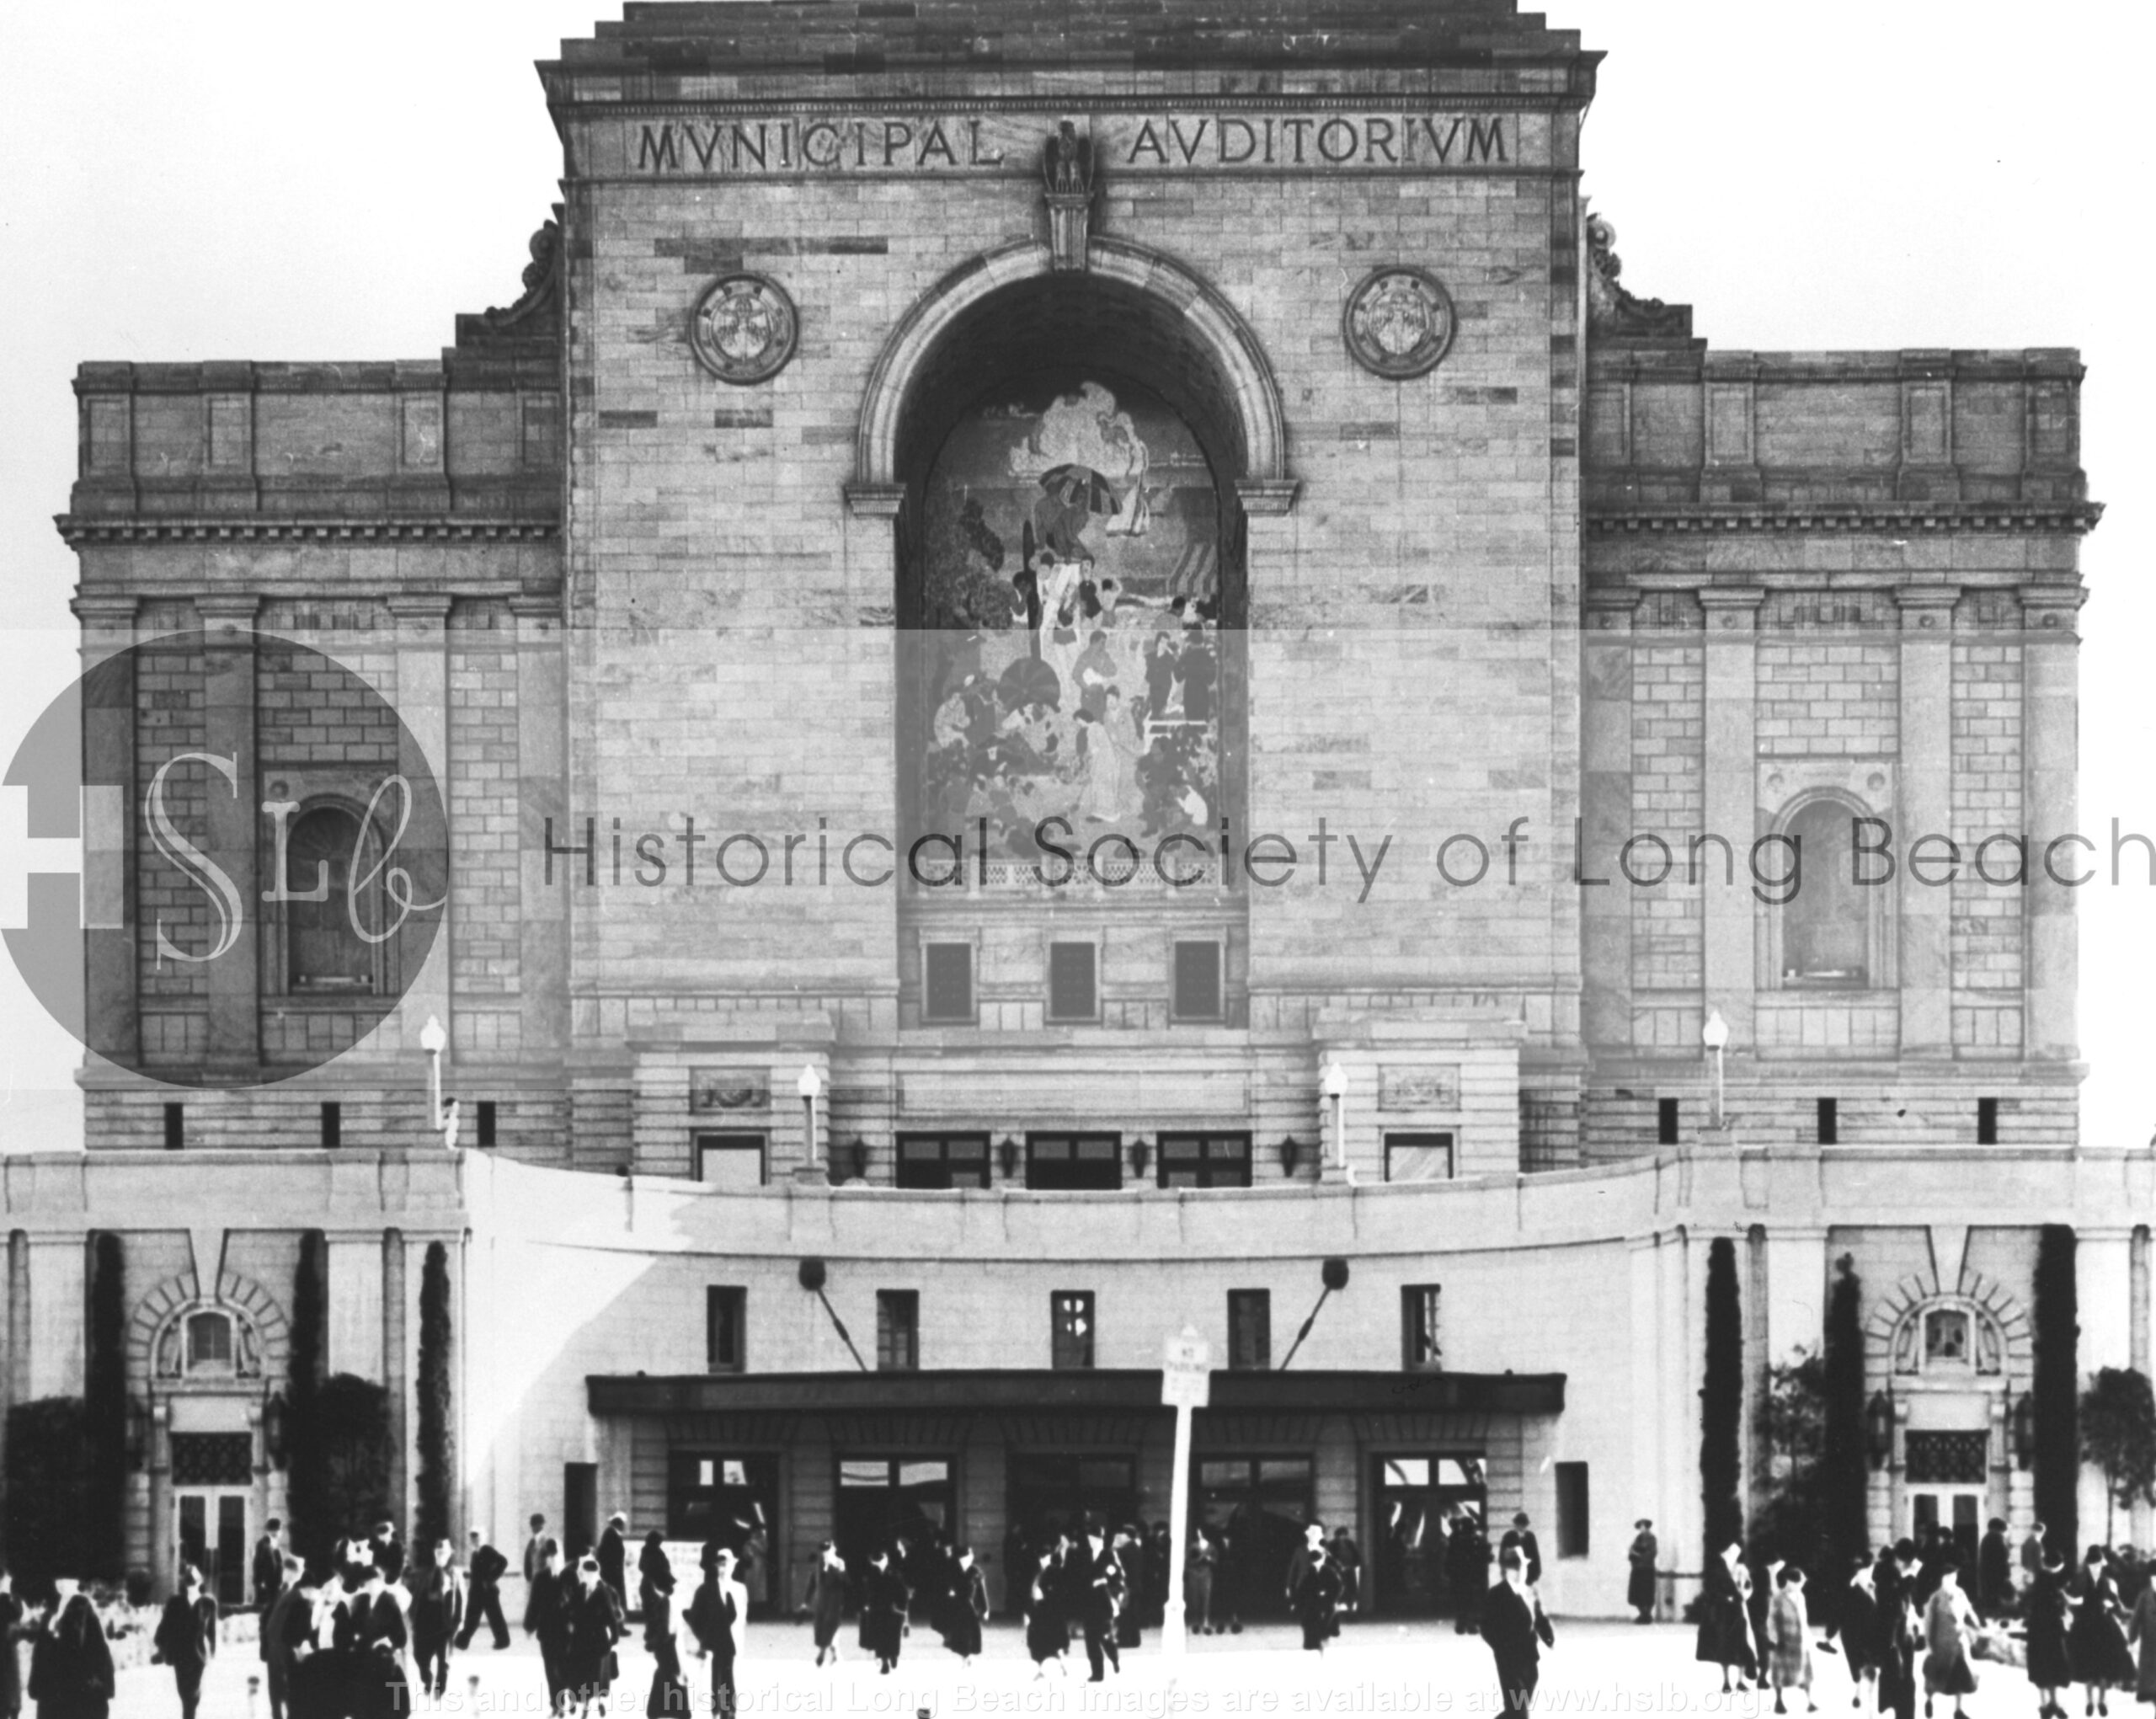 Municipal Auditorium mosaic, 1939